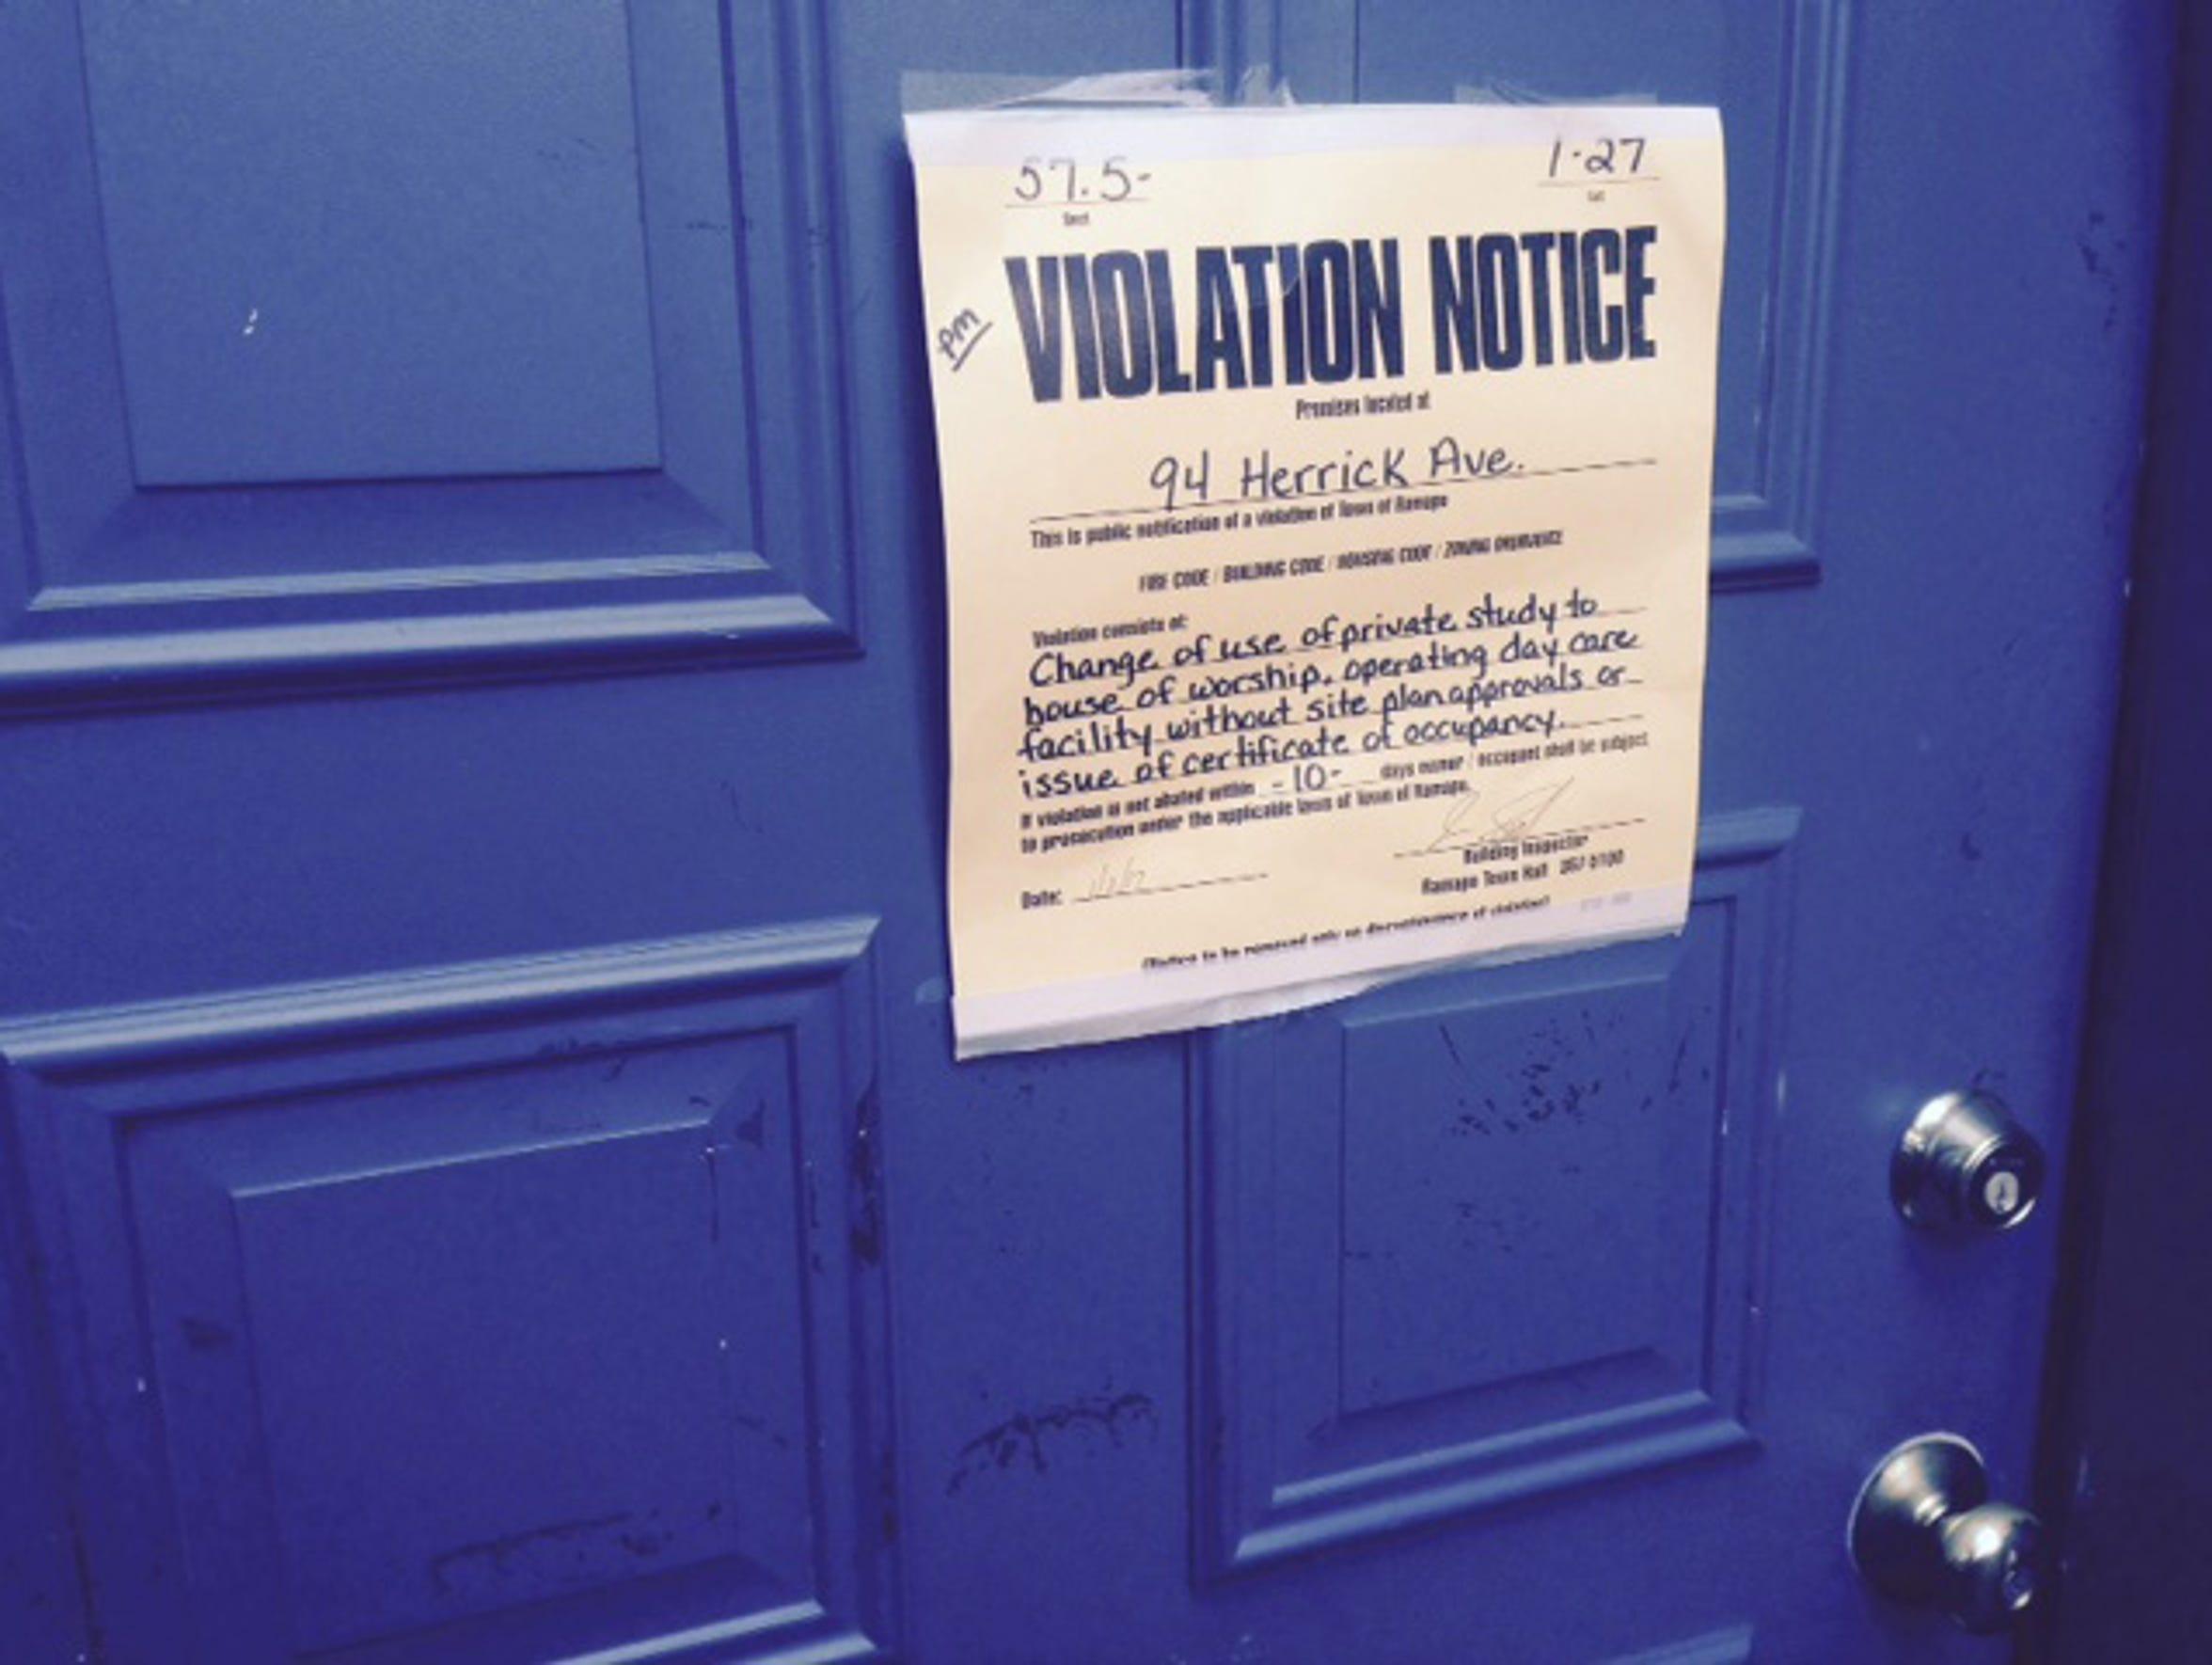 Ramapo violation notice posted on the door of 94 Herrick